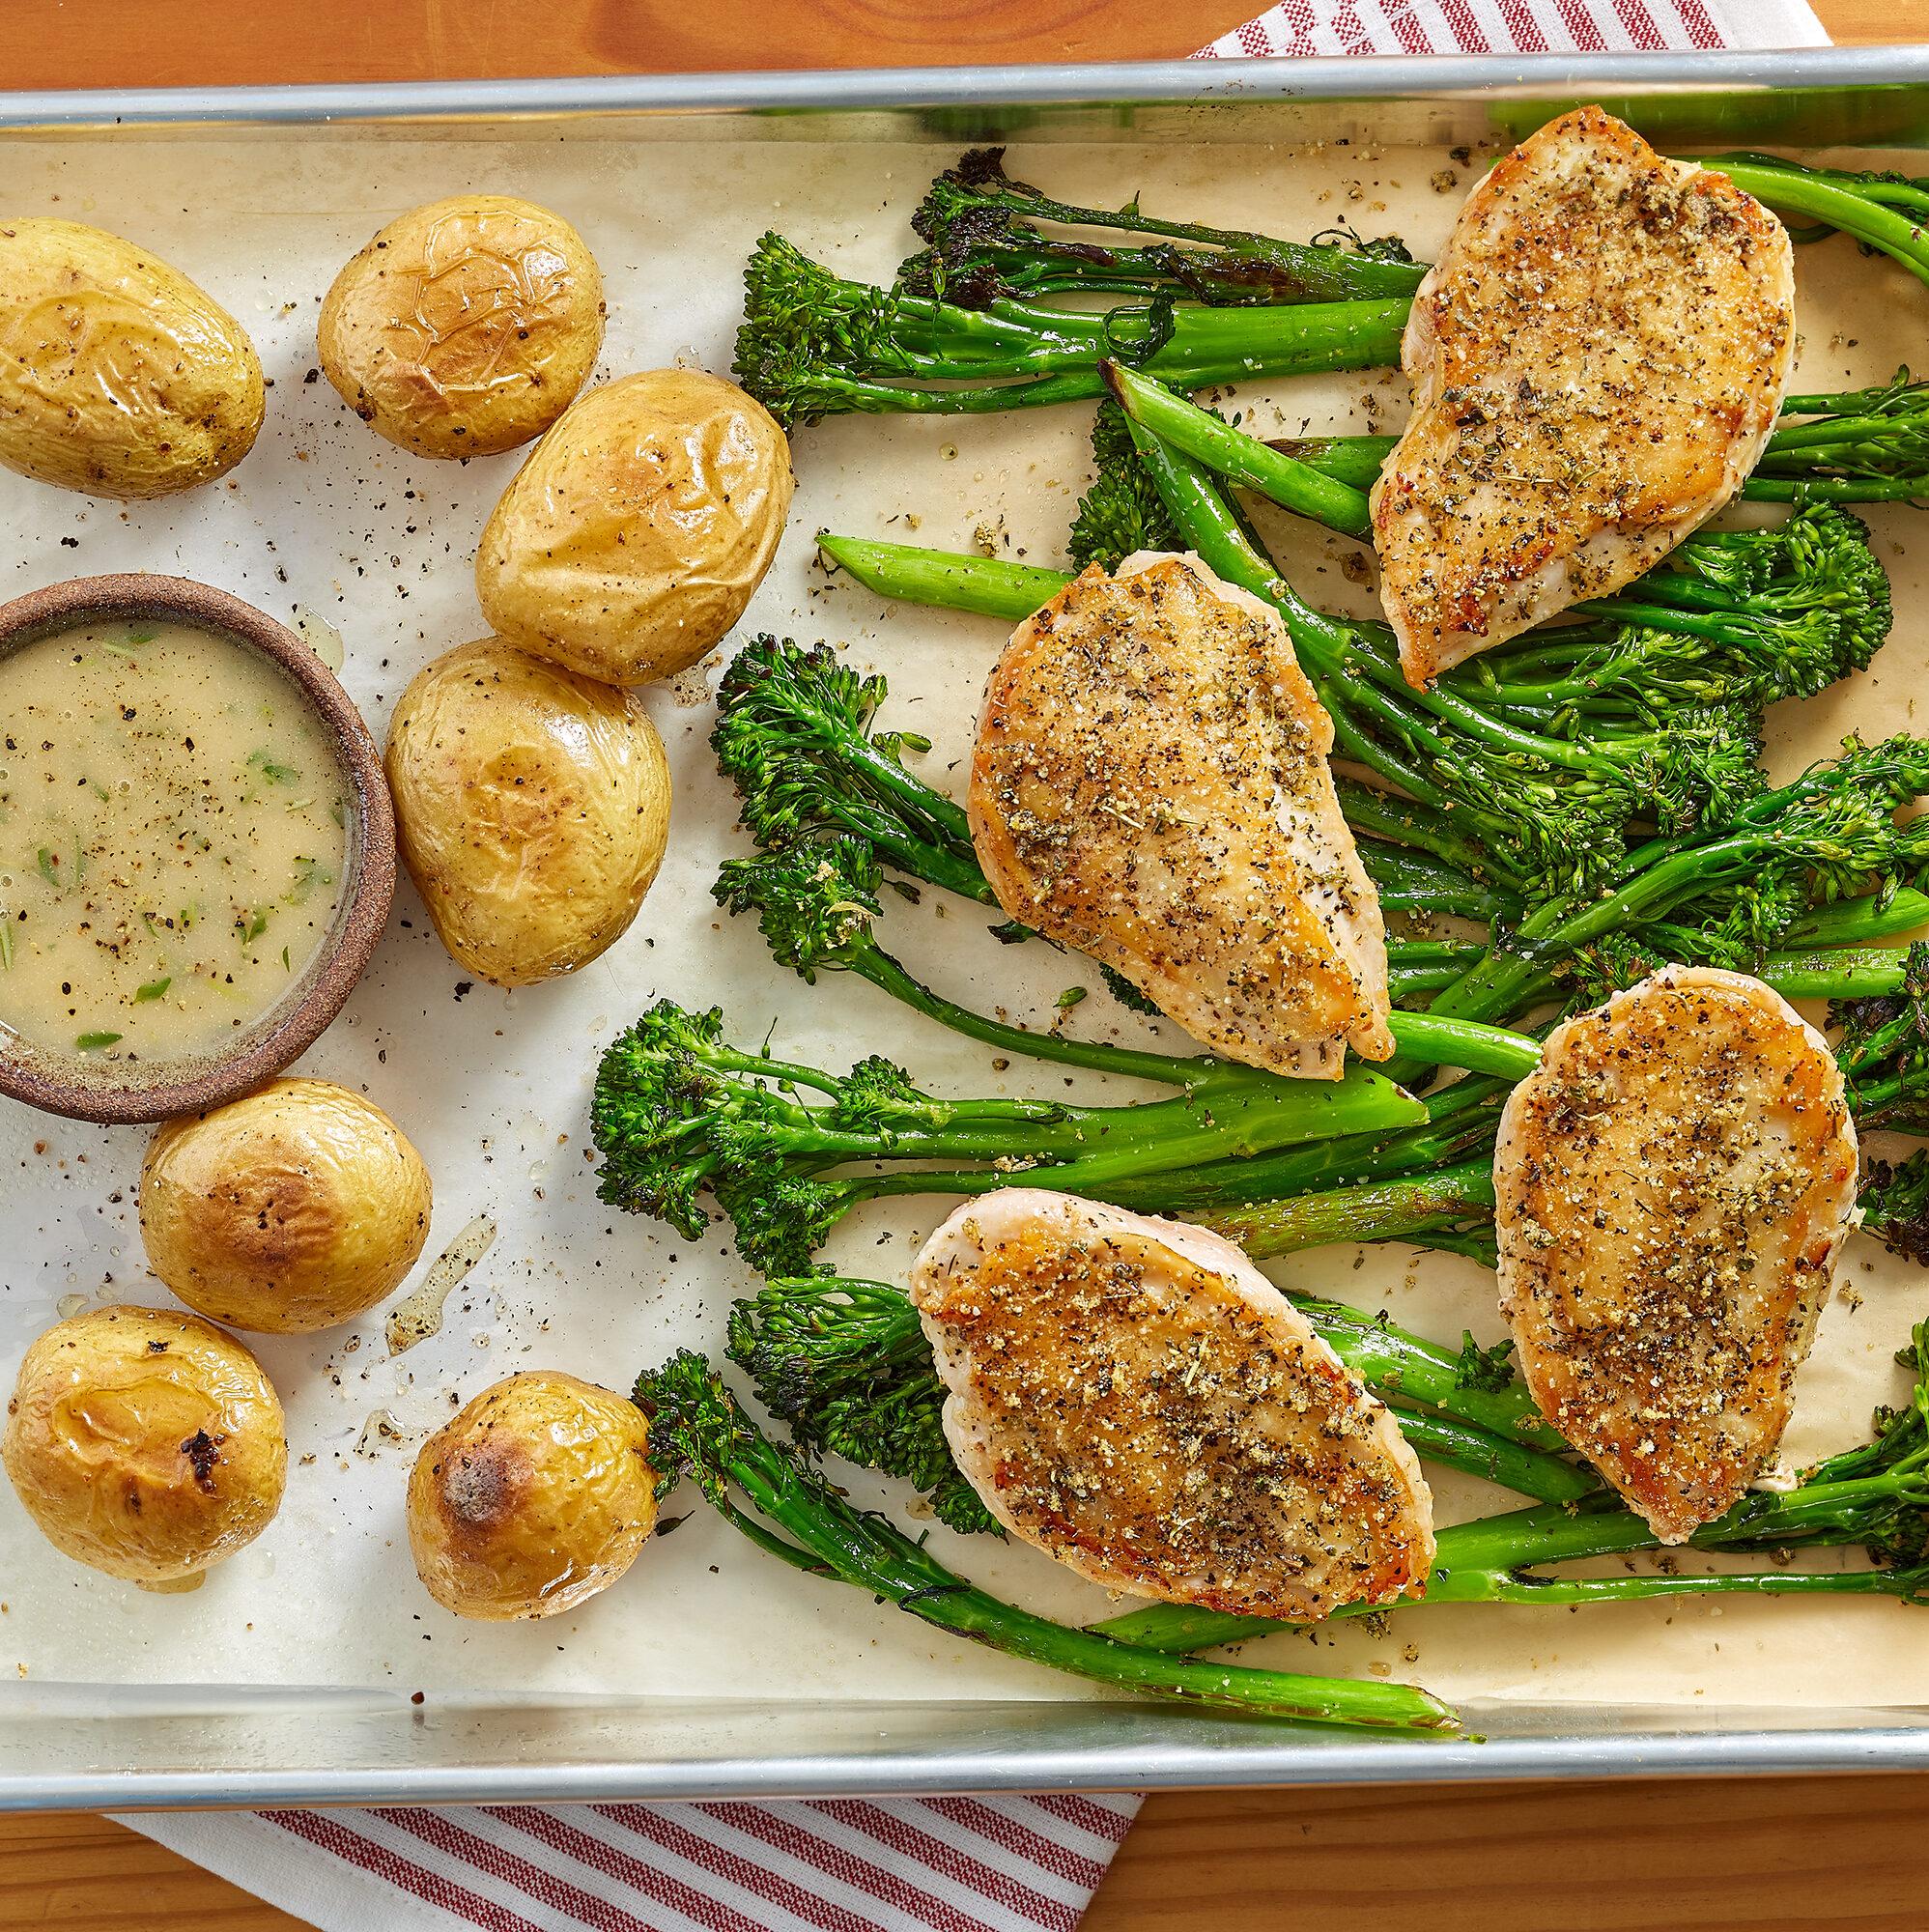 Sheet Pan Lemon Dijon Herb Chicken with Broccolini & Potatoes for Four